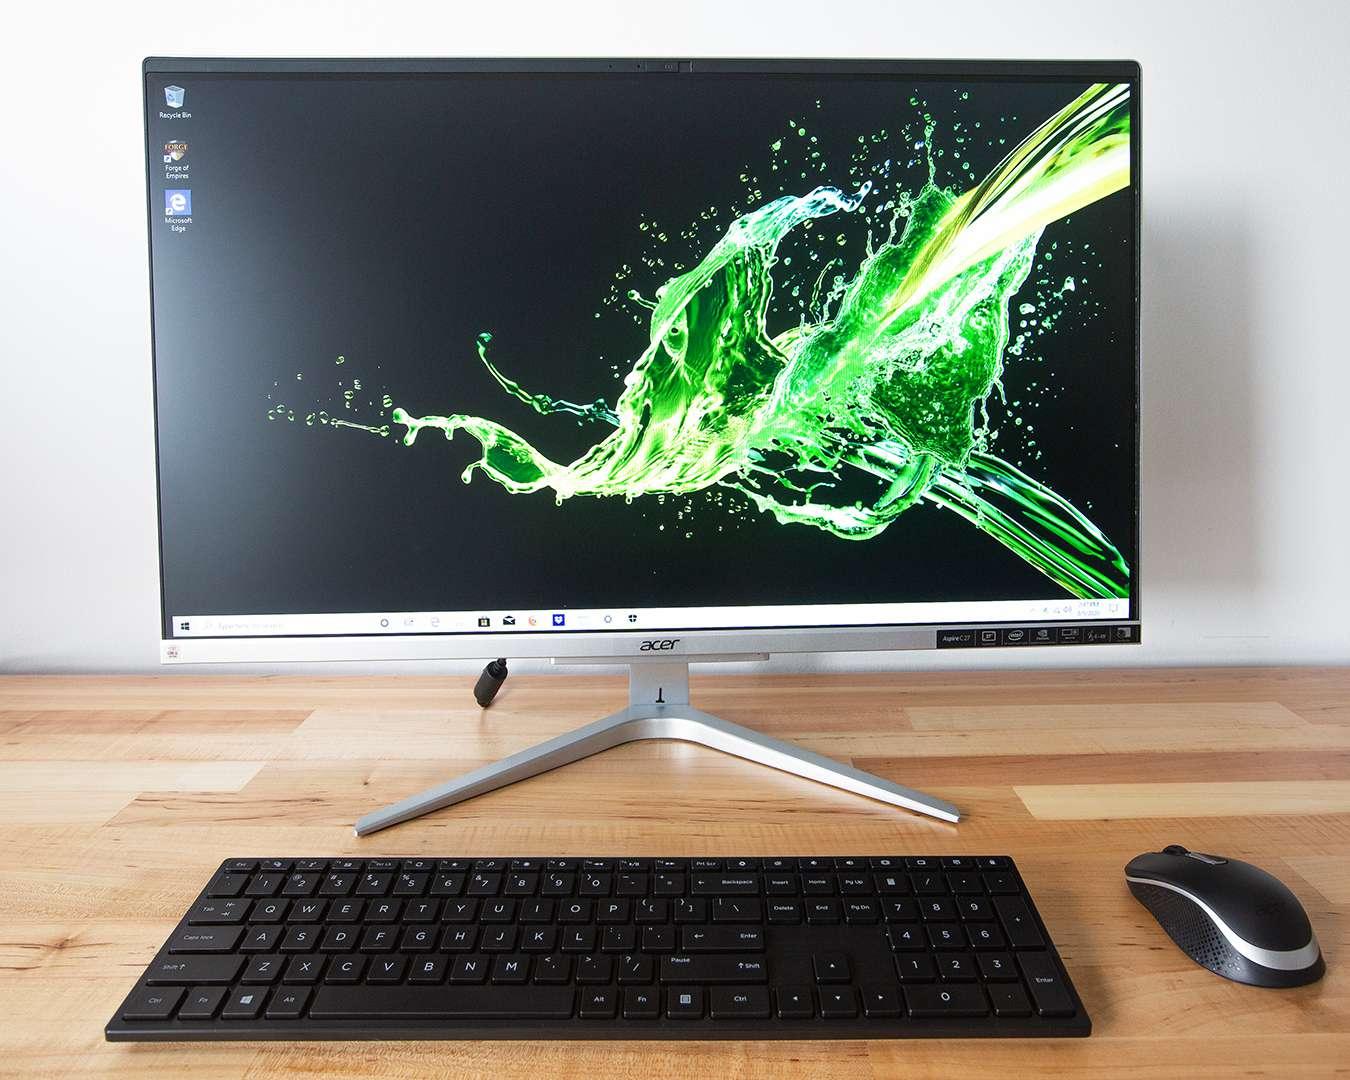 Acer Aspire C27 Desktop PC